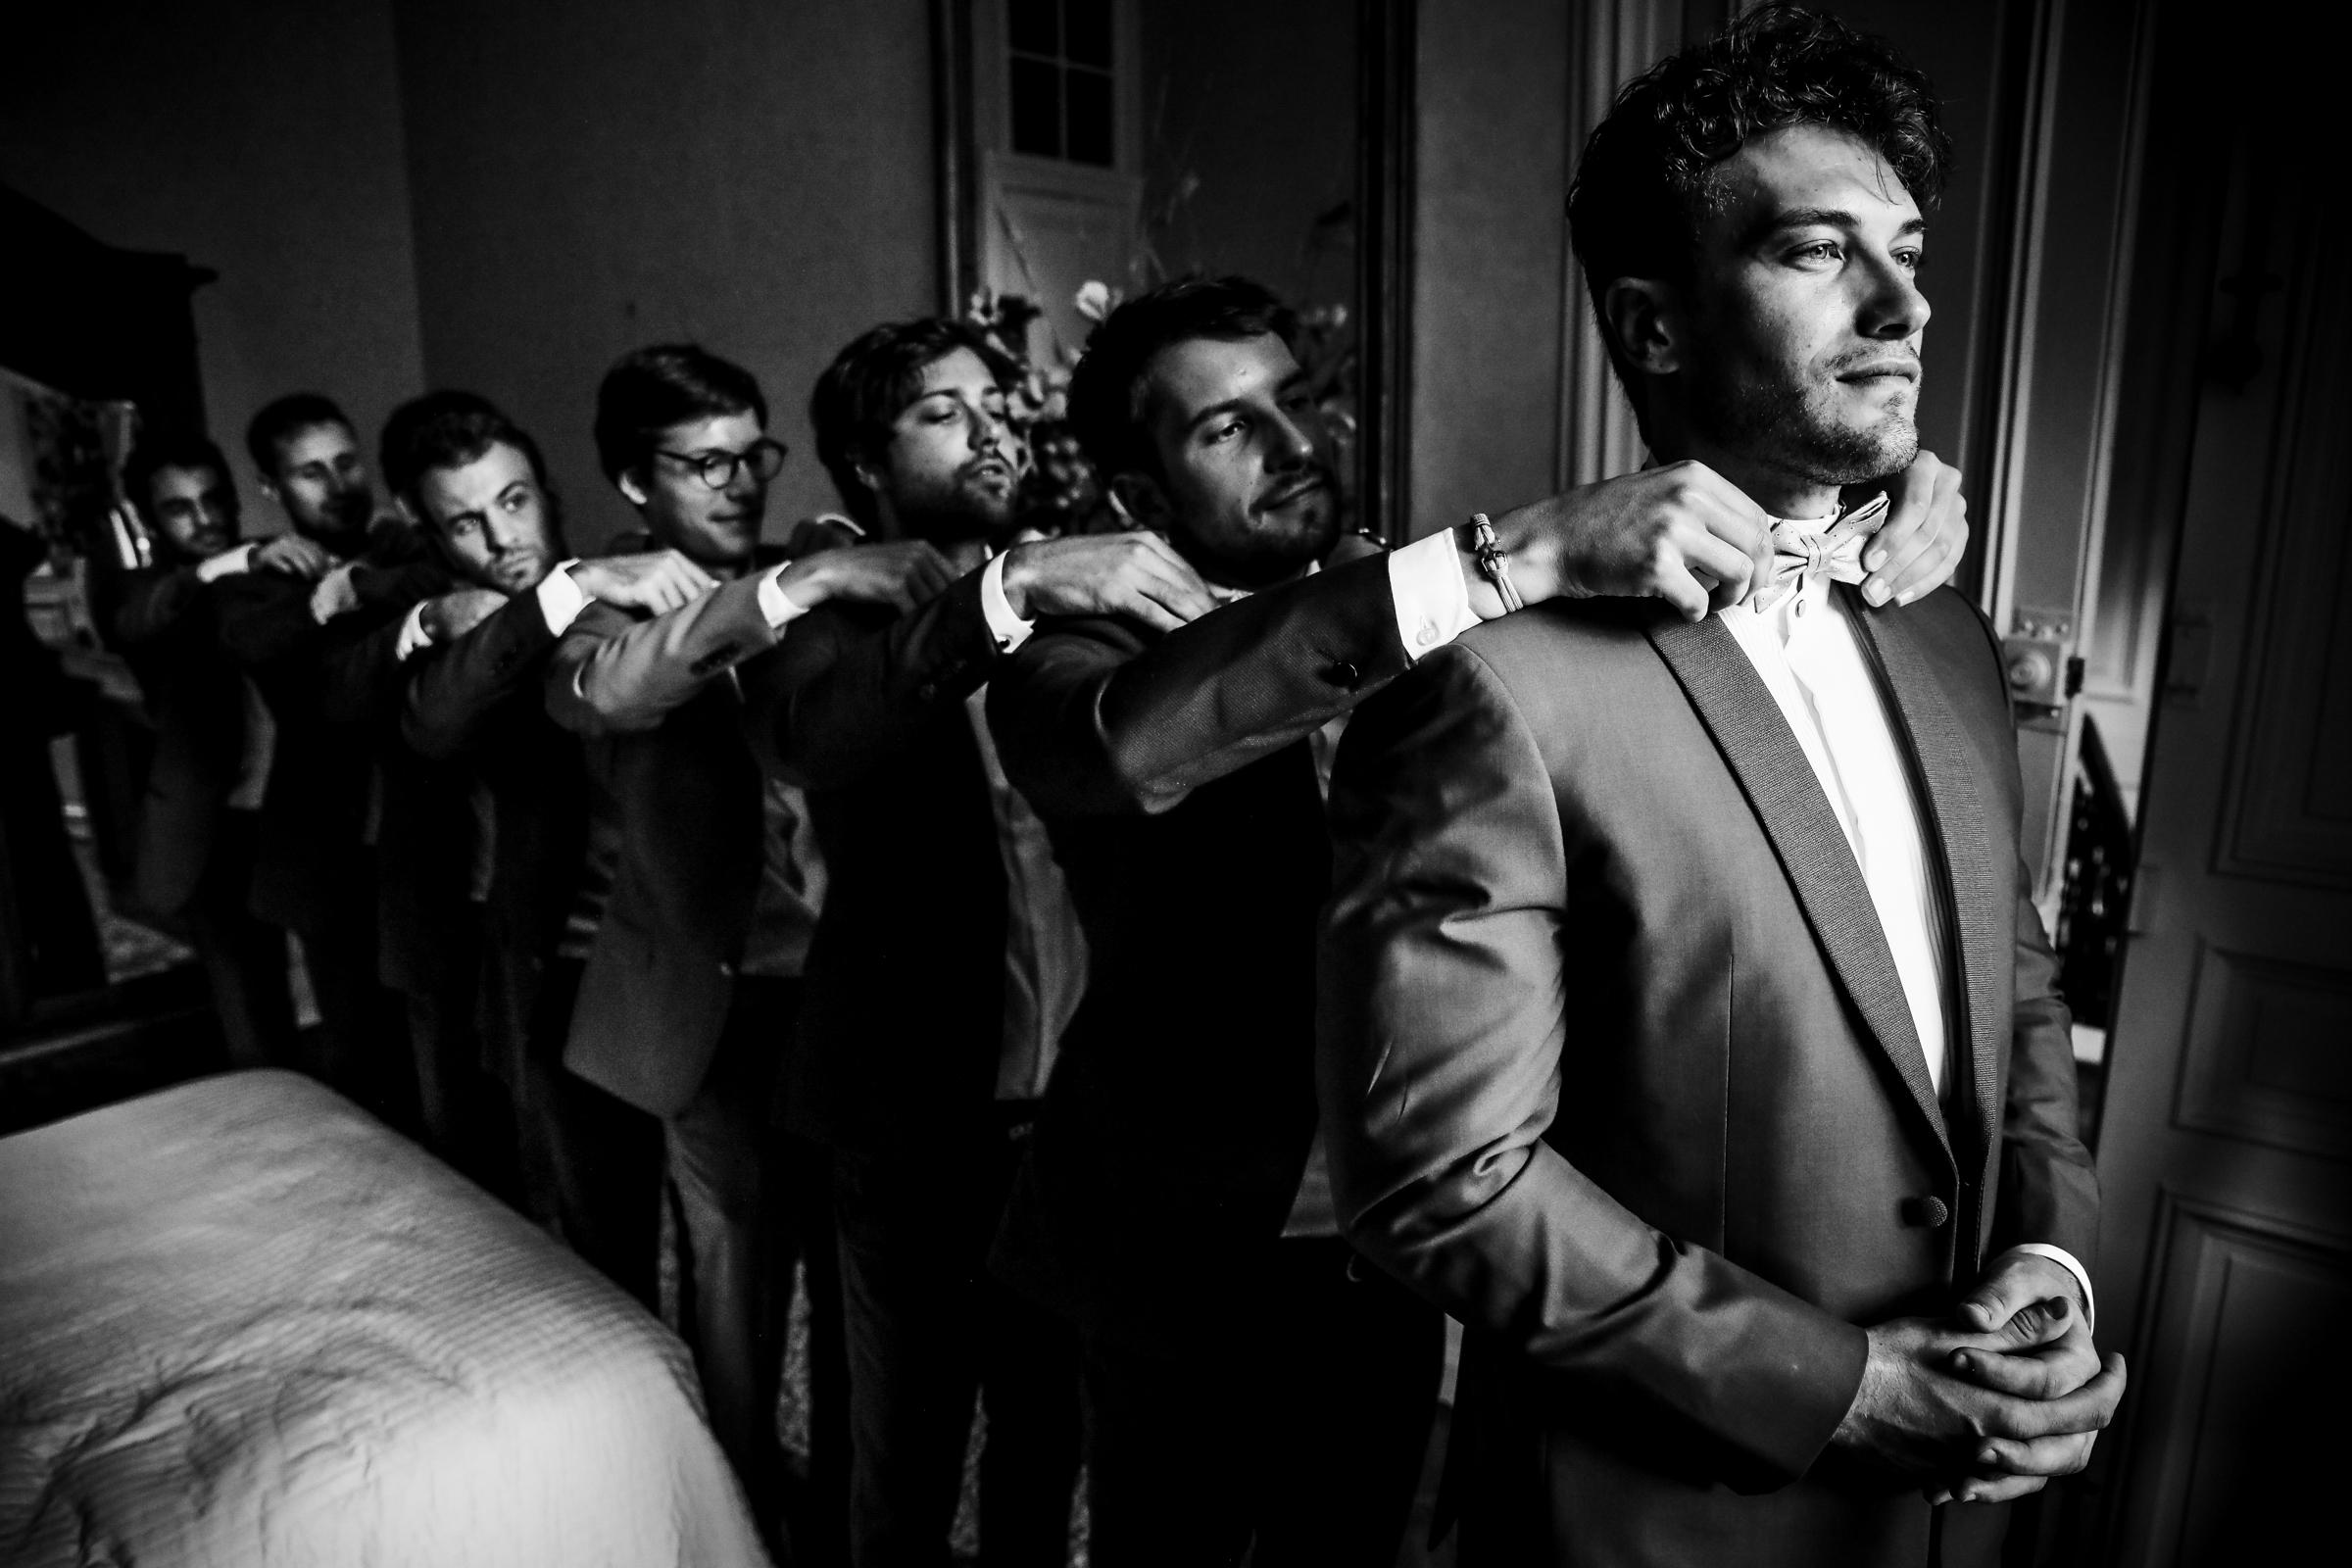 Groomsmen in a bowtie line - photo by Julien Laurent-Georges